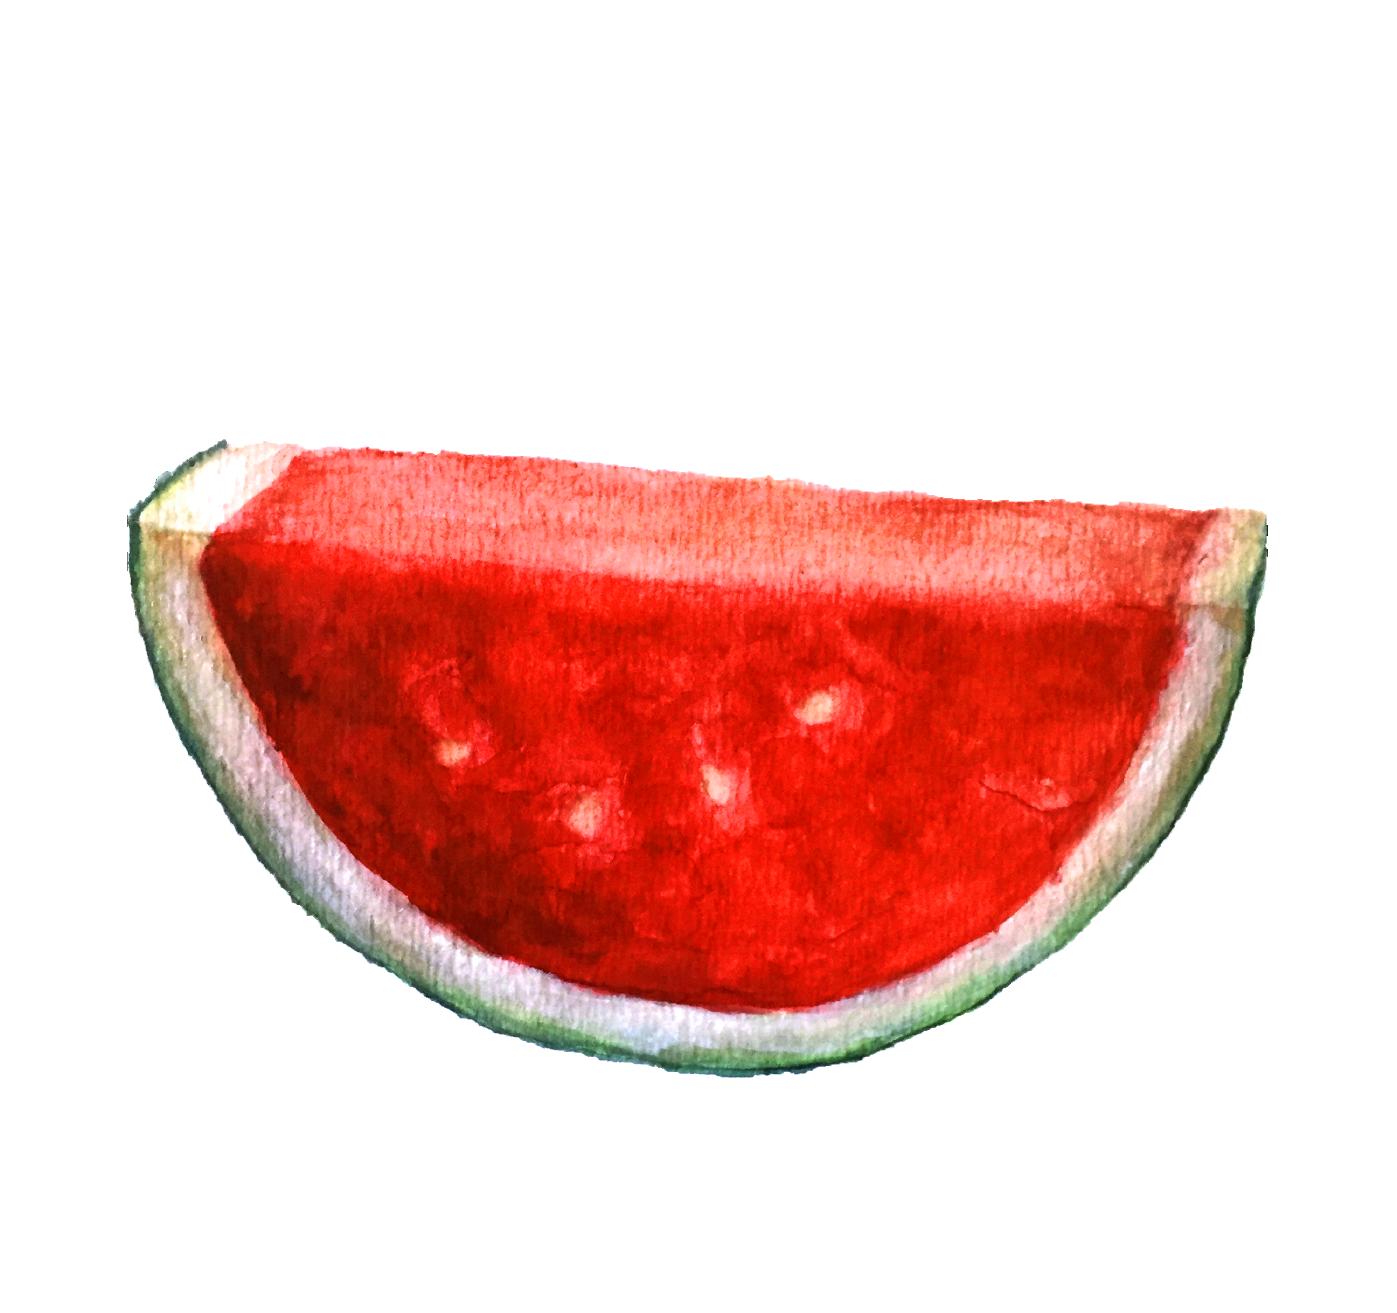 watermelon_watercolor